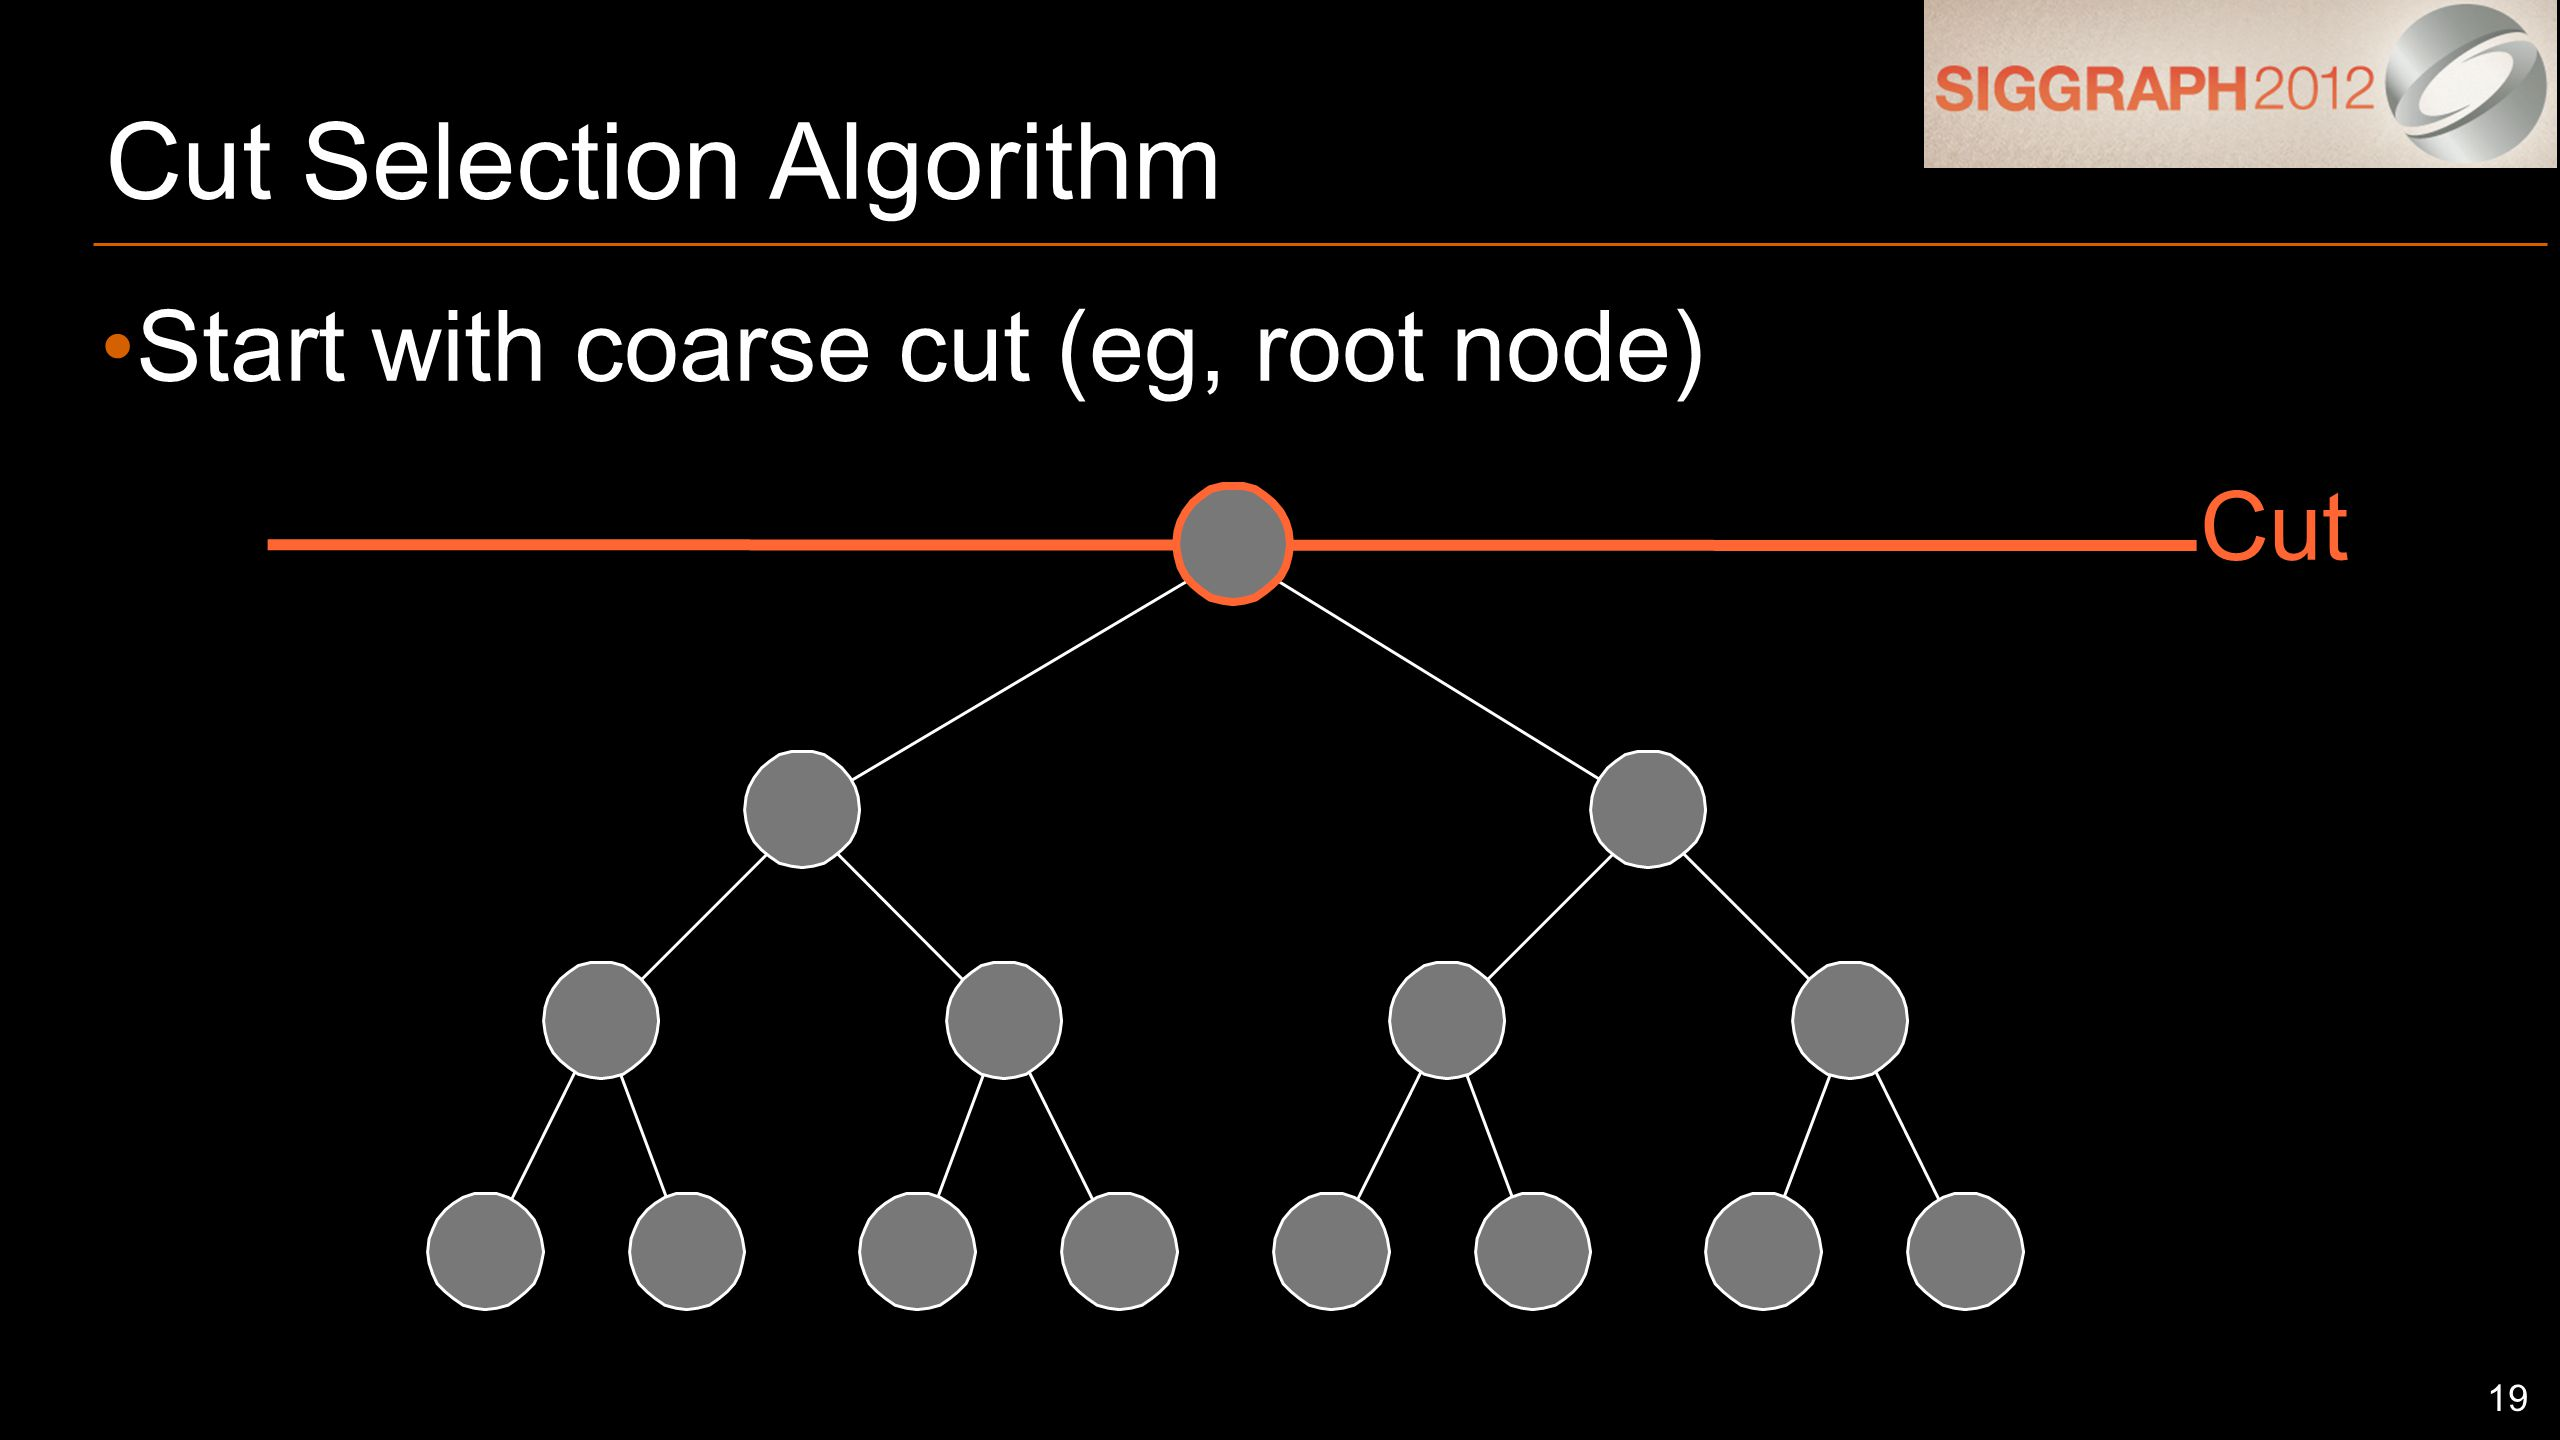 19 Cut Selection Algorithm Start with coarse cut (eg, root node) Cut